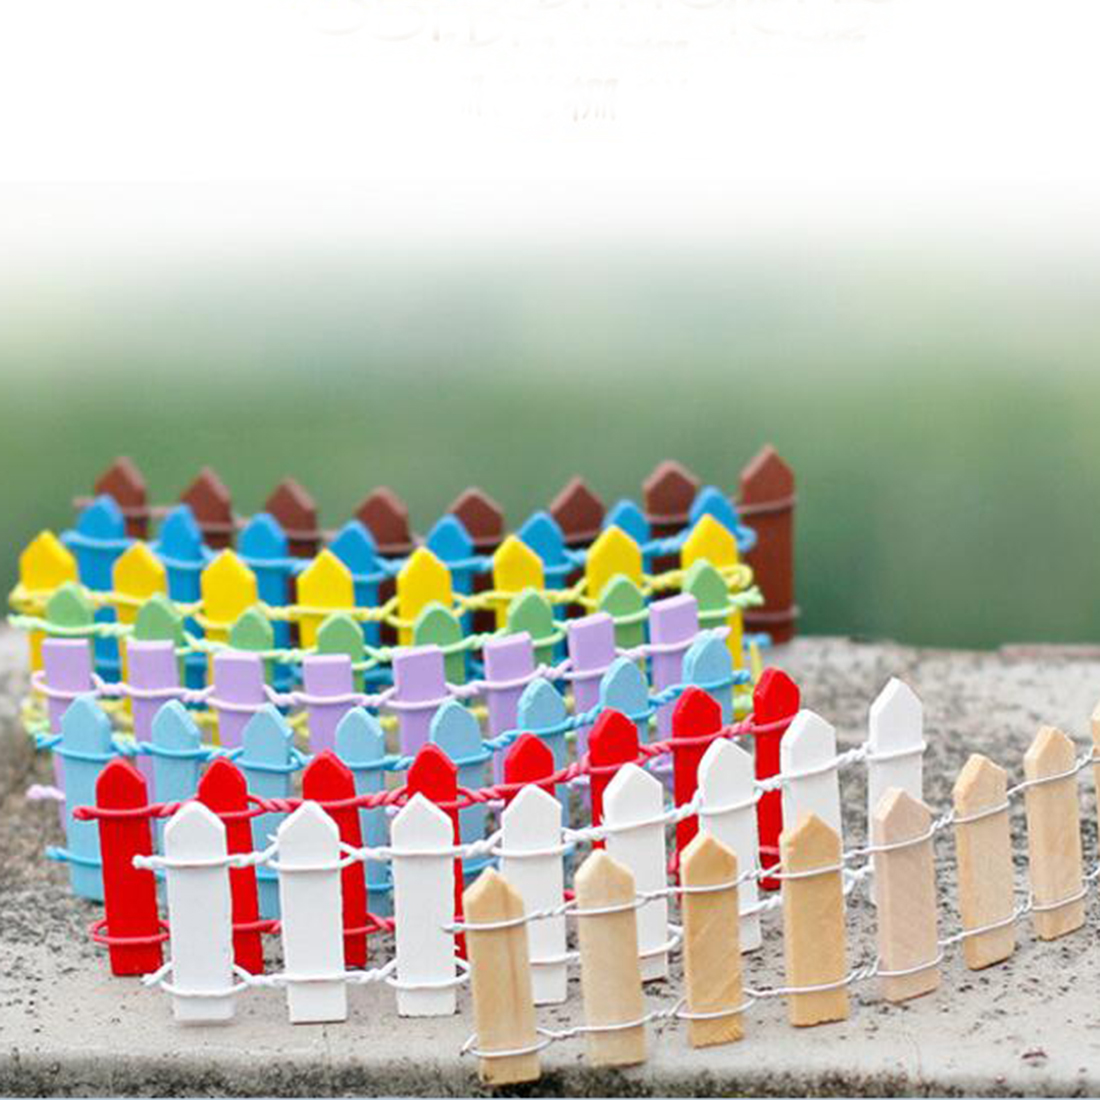 venta caliente unids suculentas carnosa musgo musgo paisaje micro decoracin valla pequea valla de madera